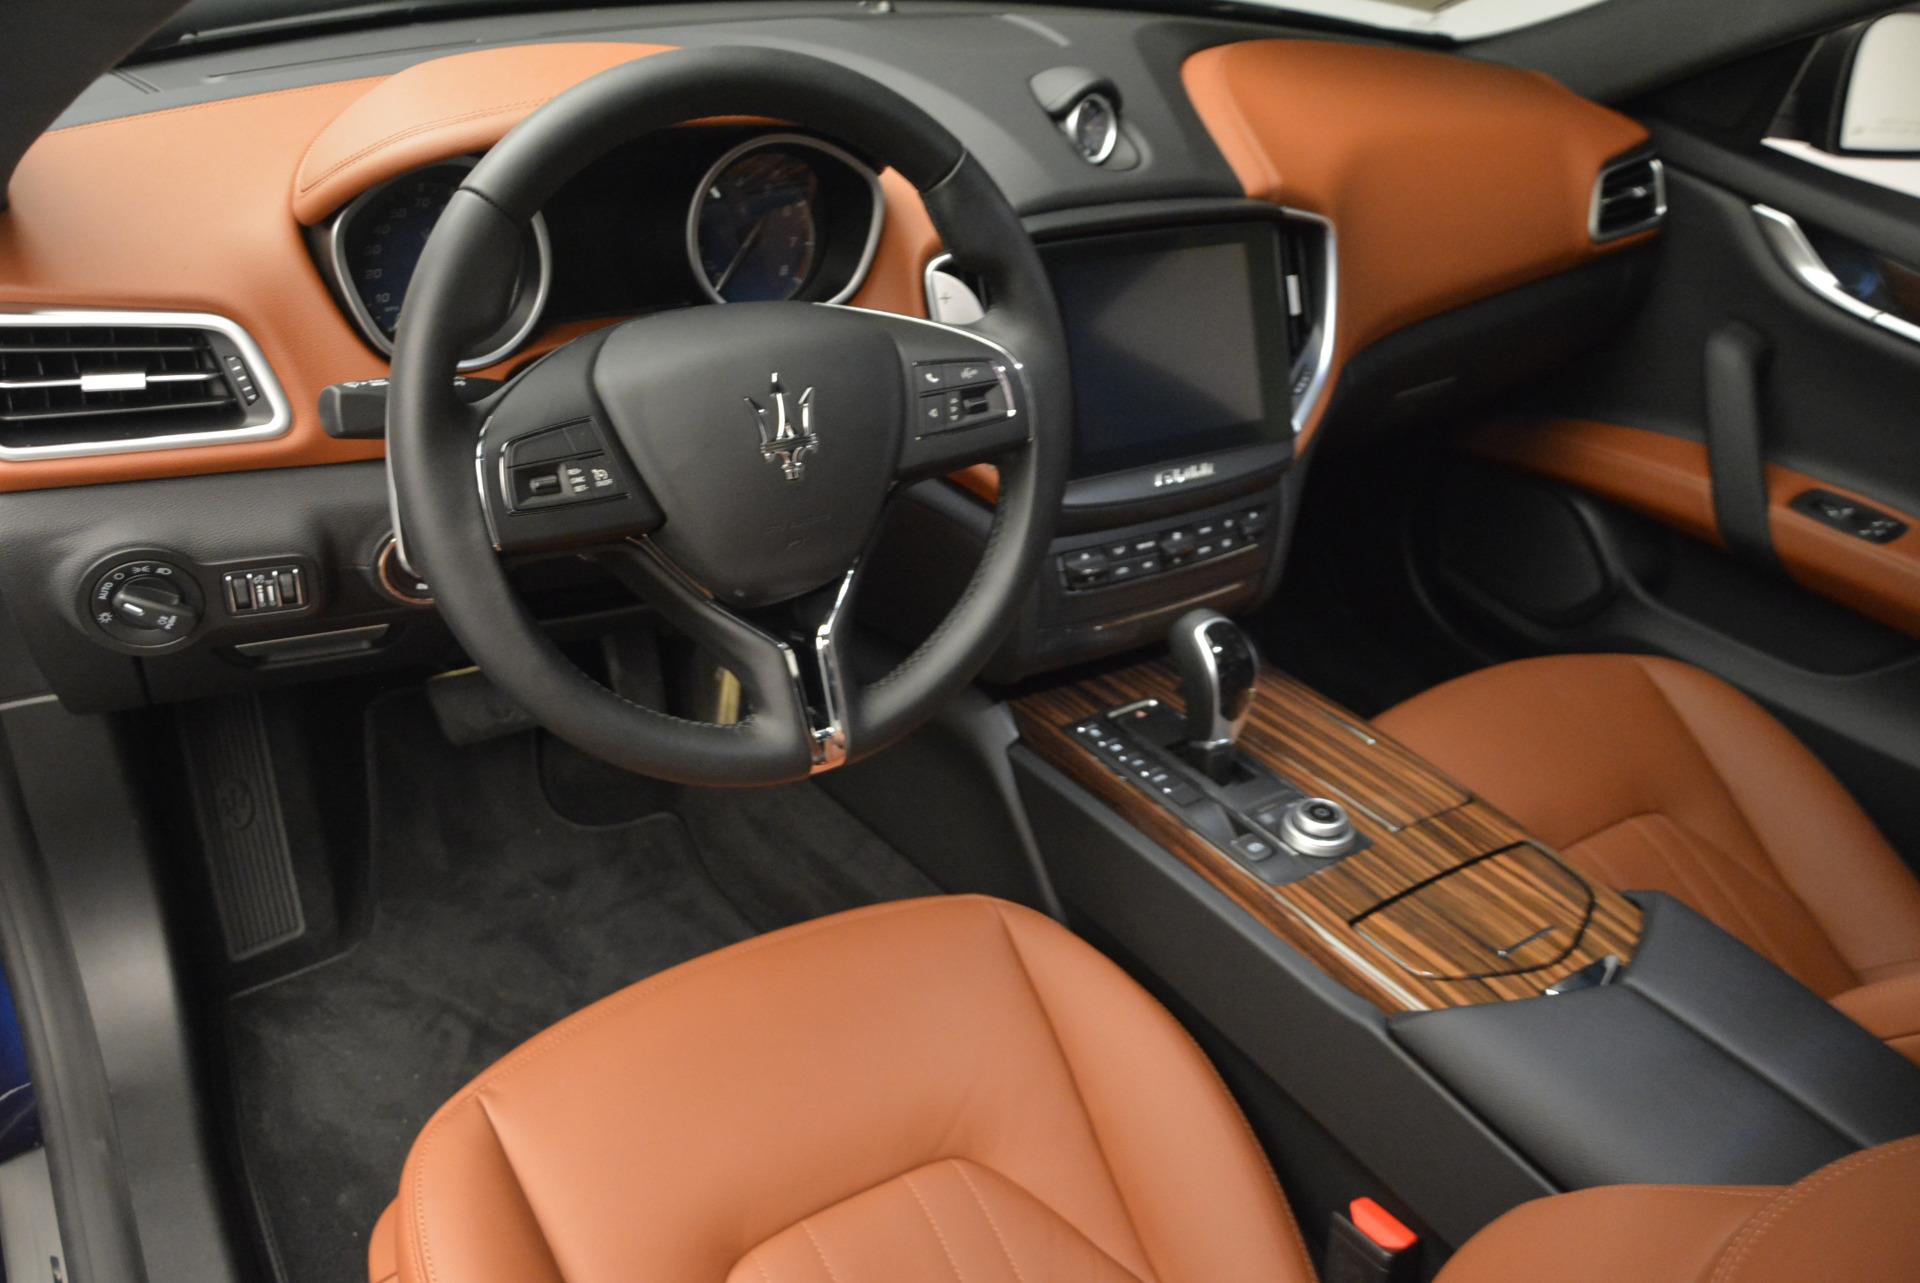 Used 2017 Maserati Ghibli S Q4 - EX Loaner For Sale In Greenwich, CT. Alfa Romeo of Greenwich, M1662 568_p13